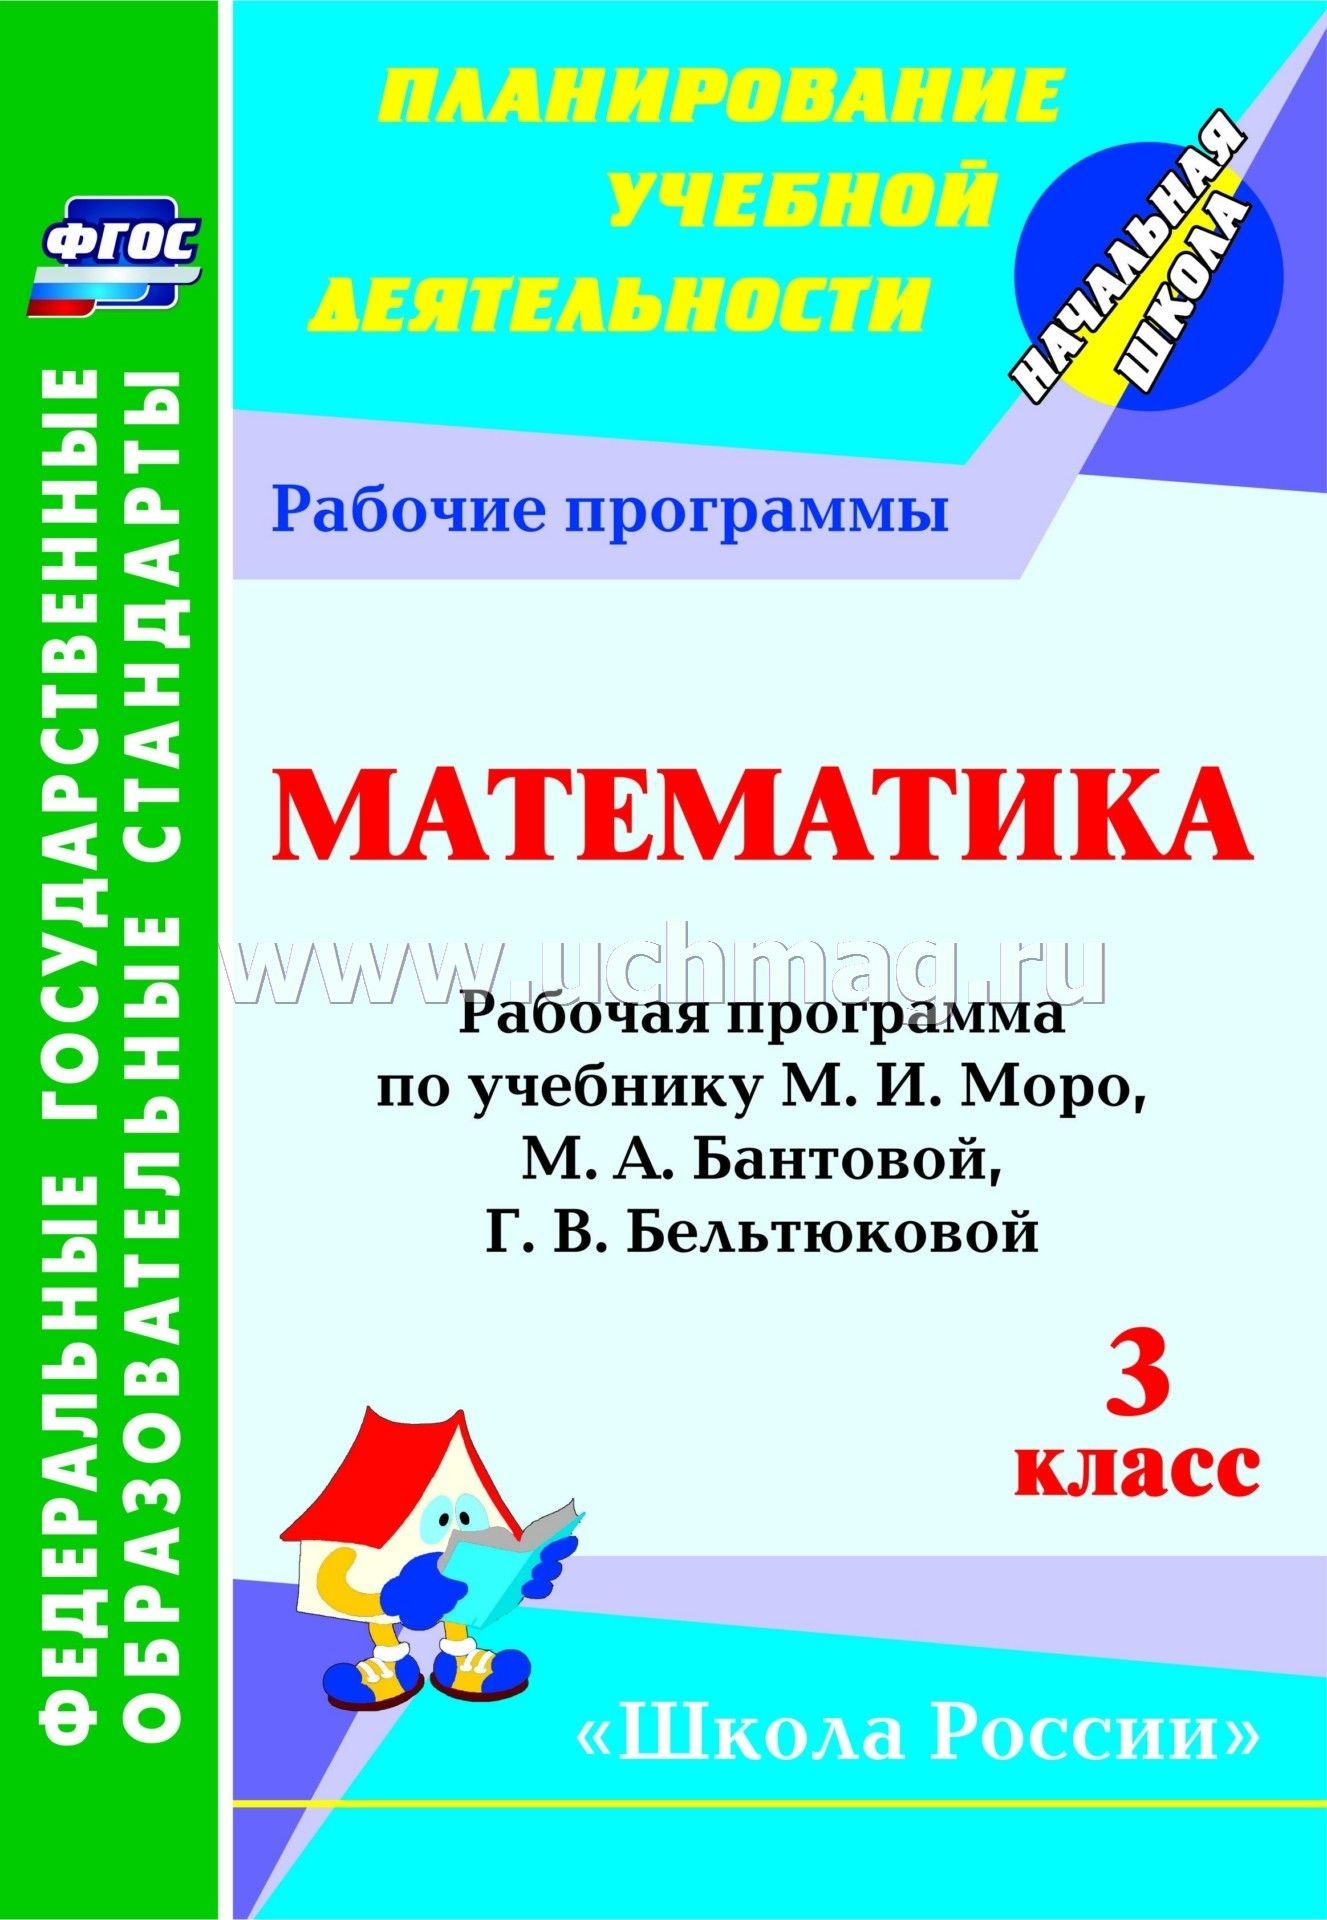 Математика 3 класс рабочая программа